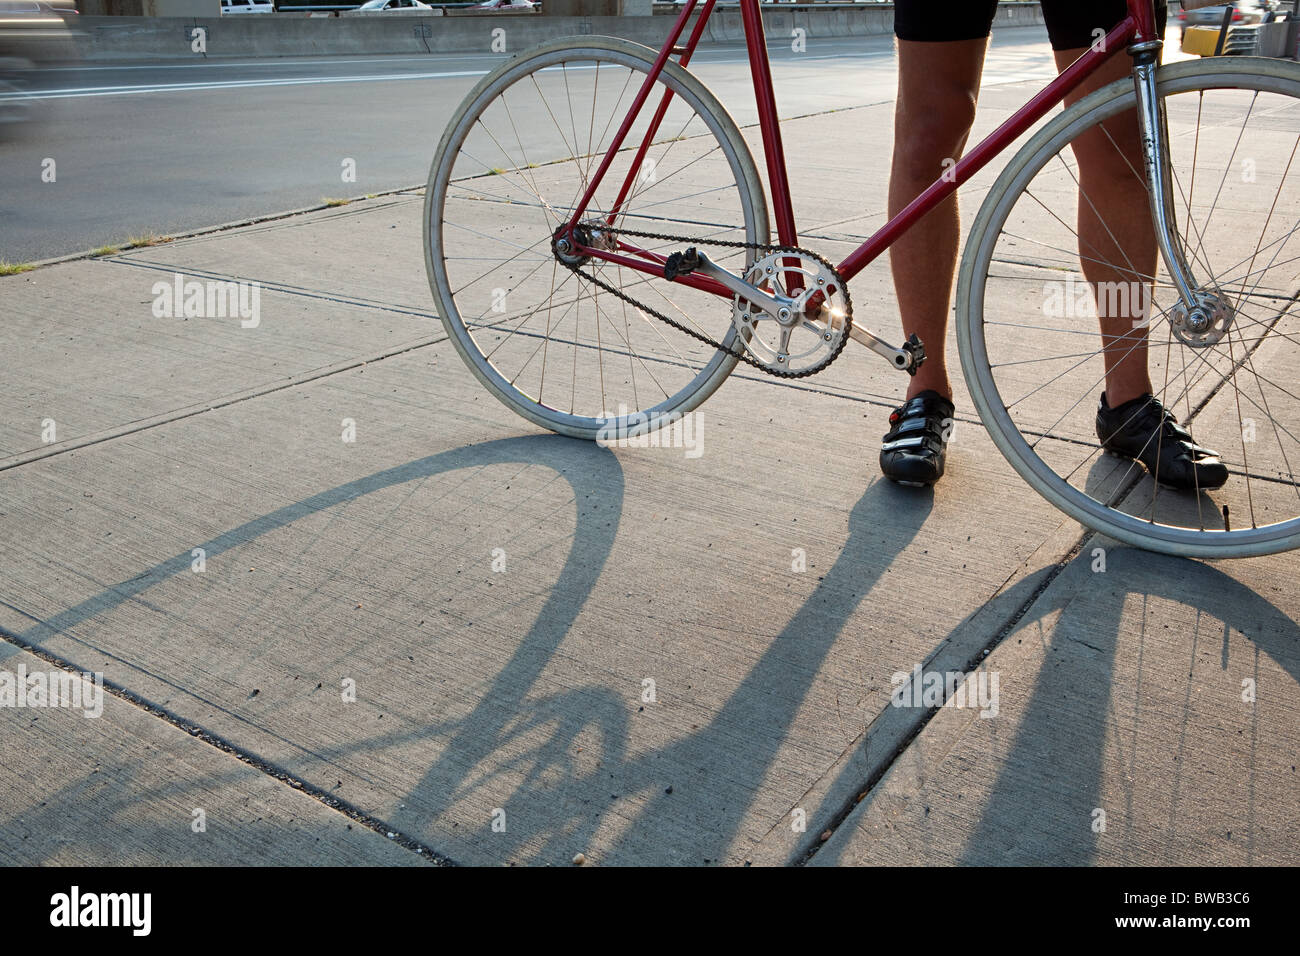 Radfahrer mit Fahrrad Stockfoto